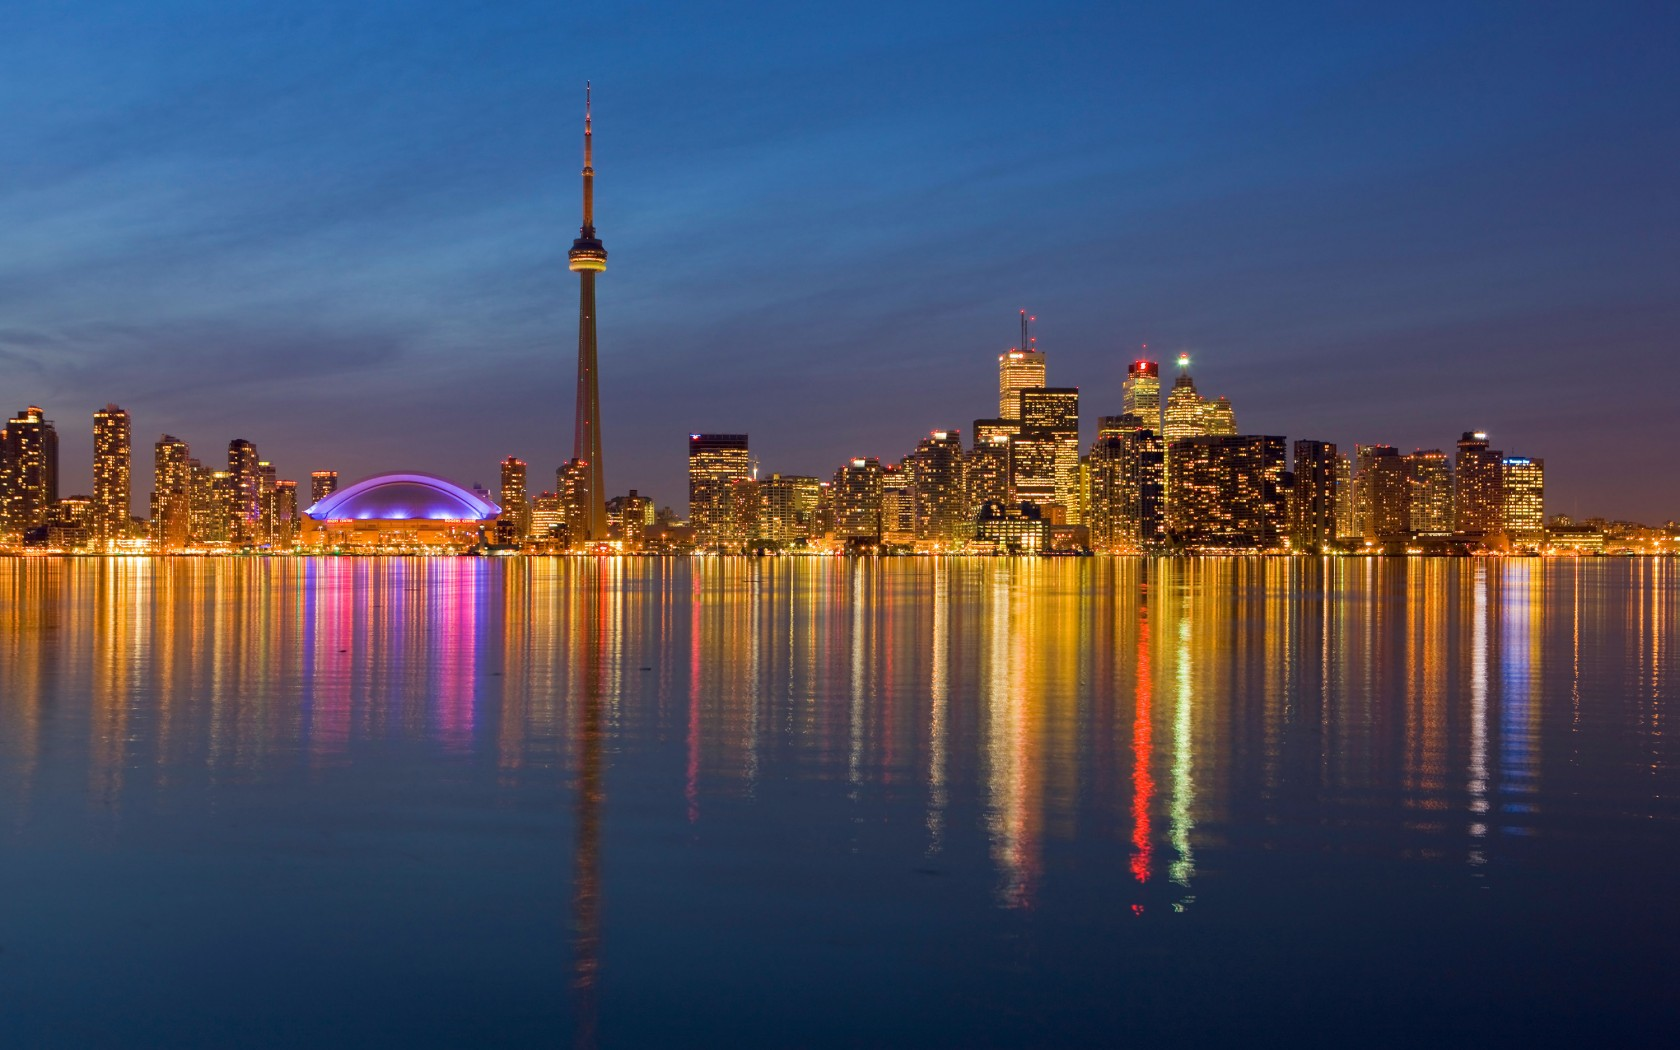 7.-Edited-Toronto-BFDP4R-1680x1050